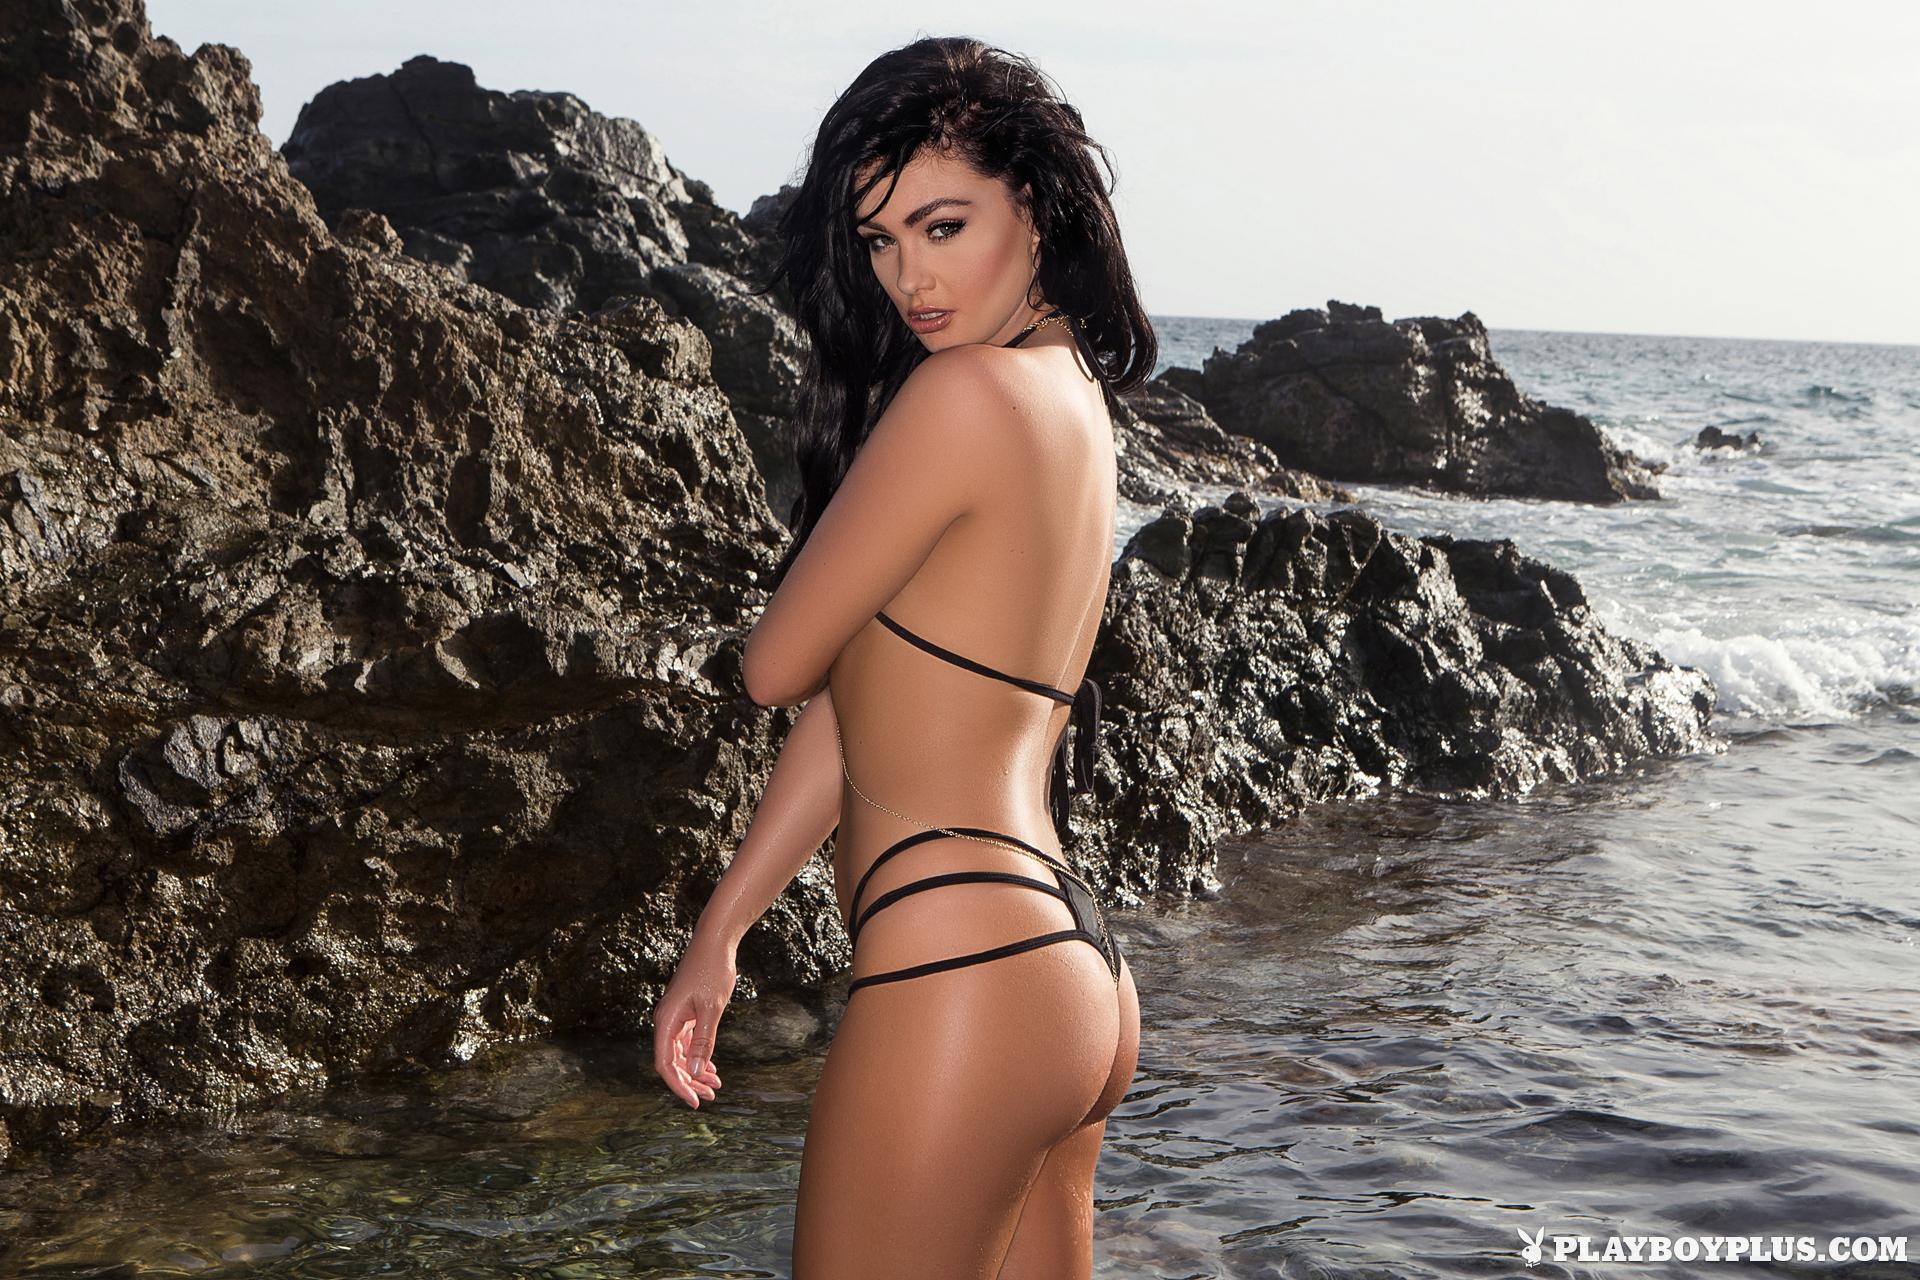 kristie-taylor-black-bikini-seaside-small-tits-naked-playboy-09